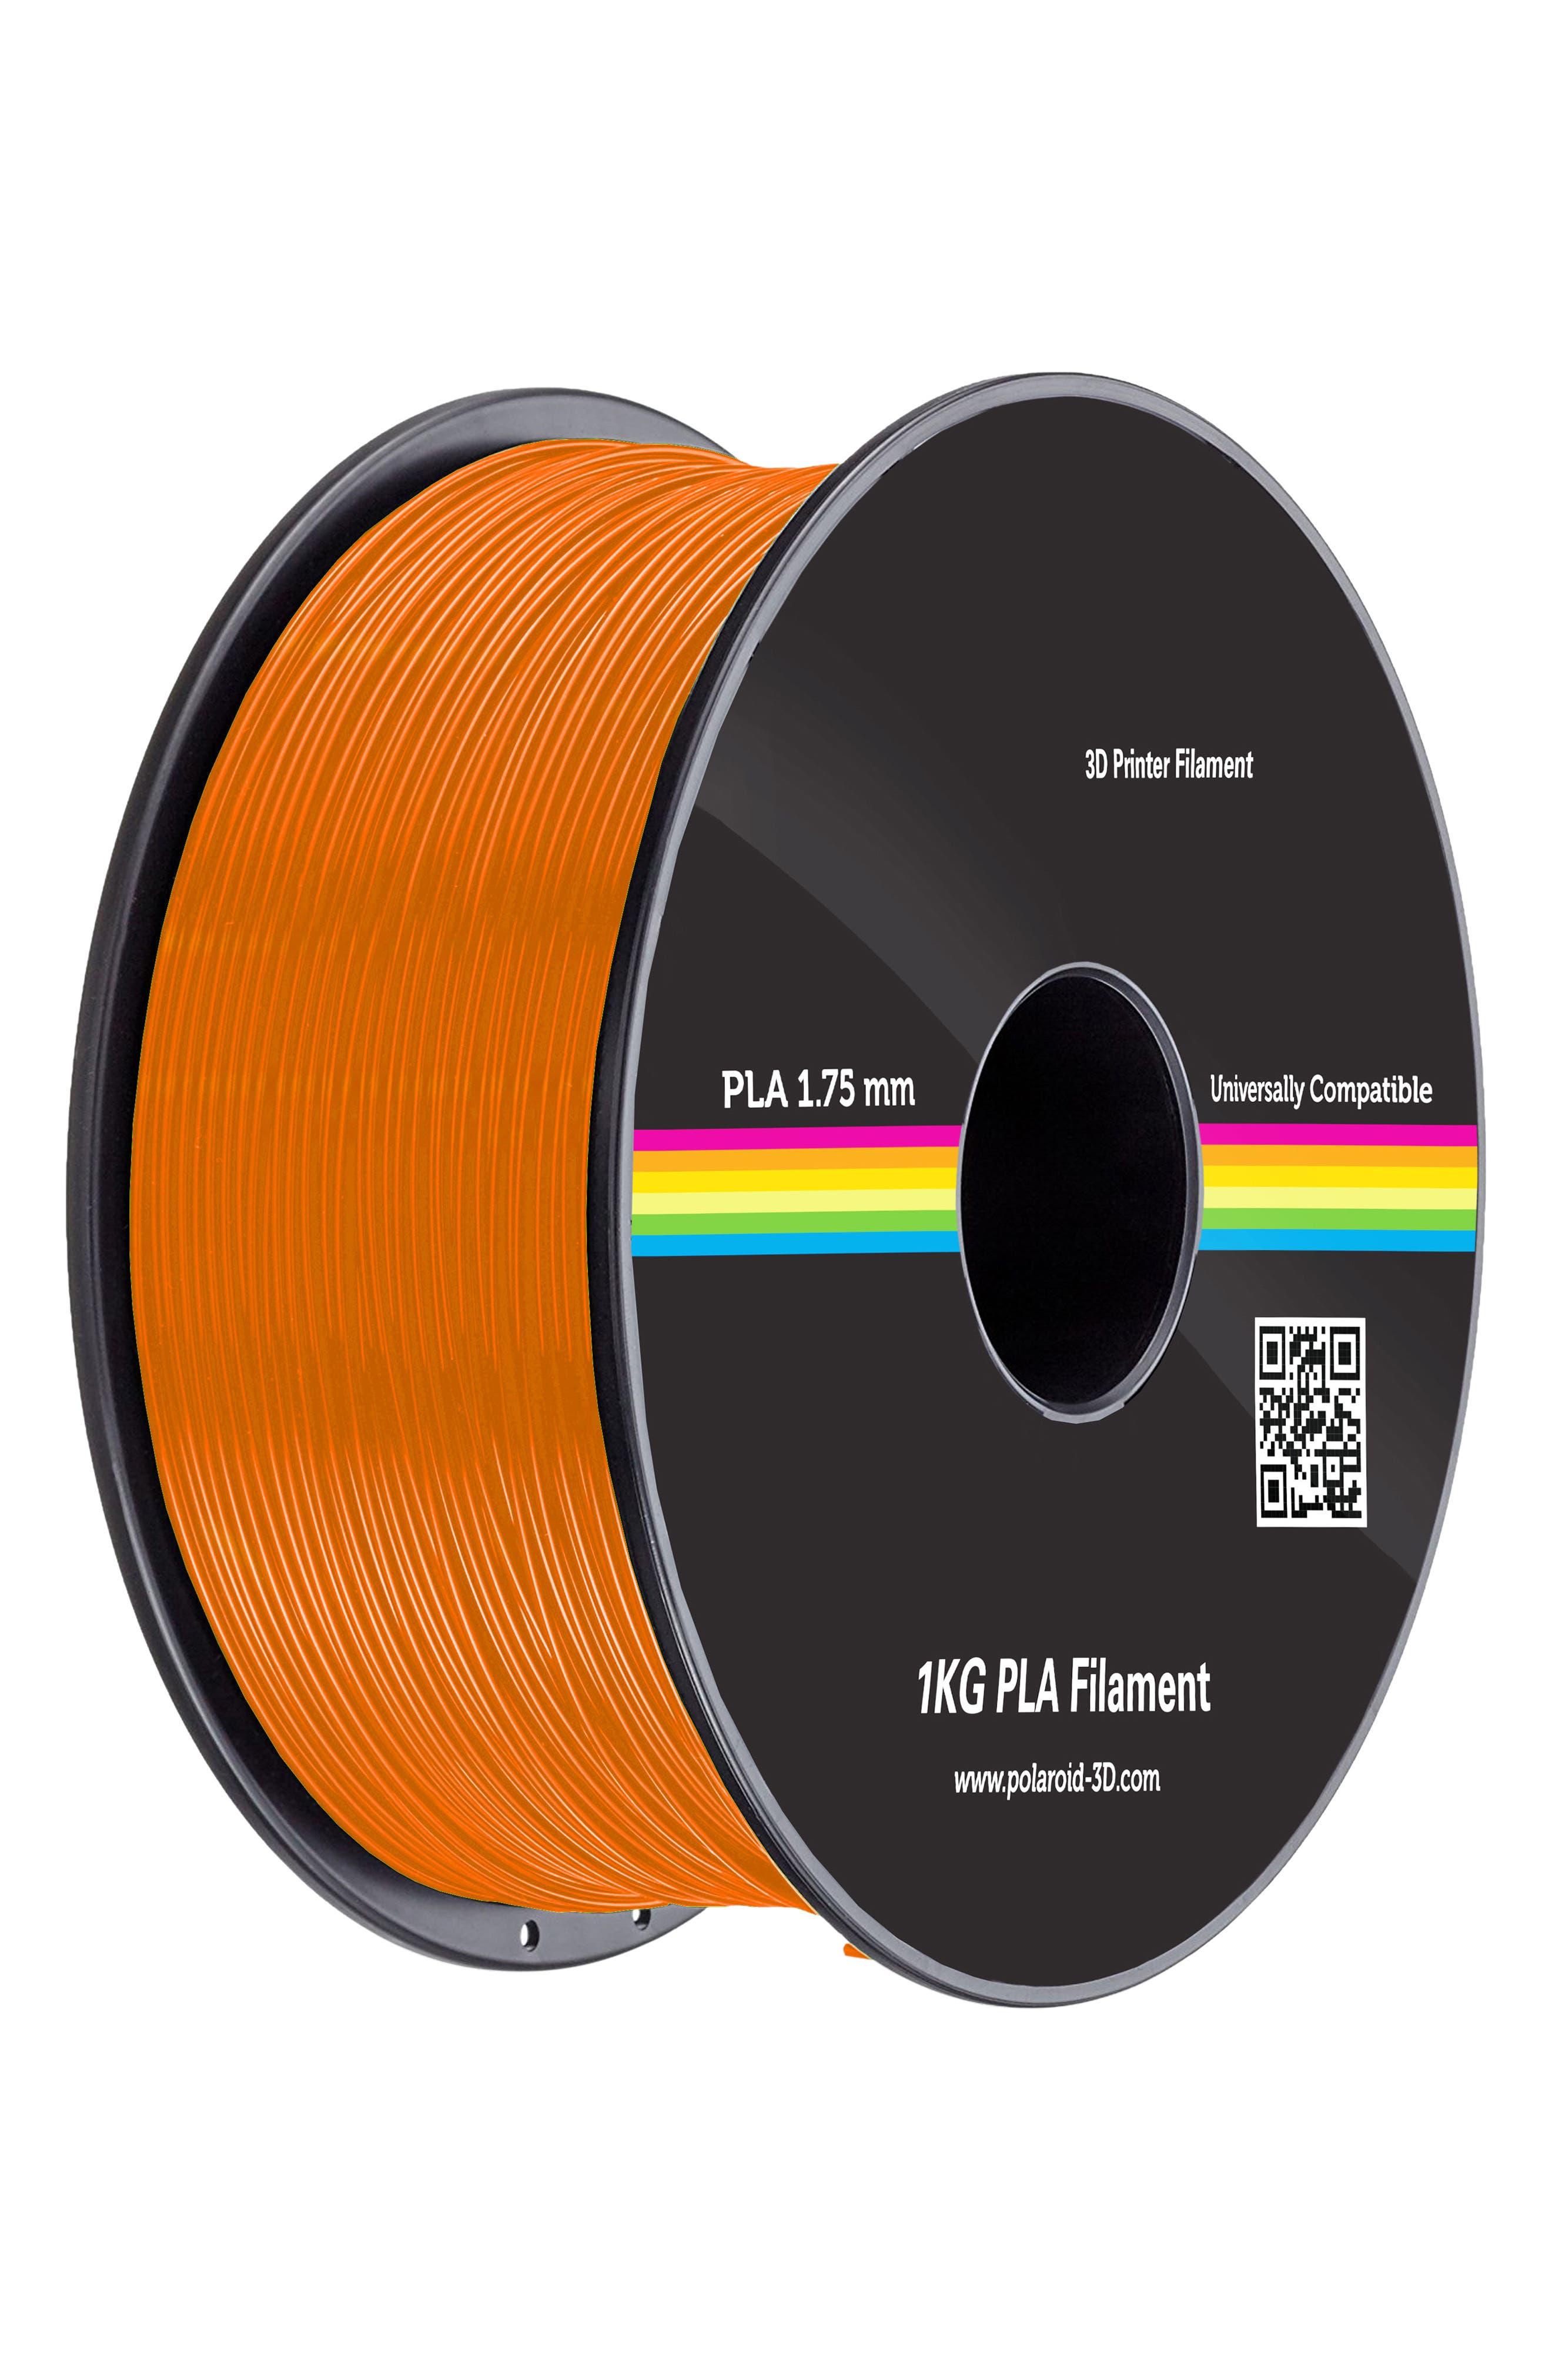 Alternate Image 1 Selected - Polaroid 3D 1KG Filament Roll